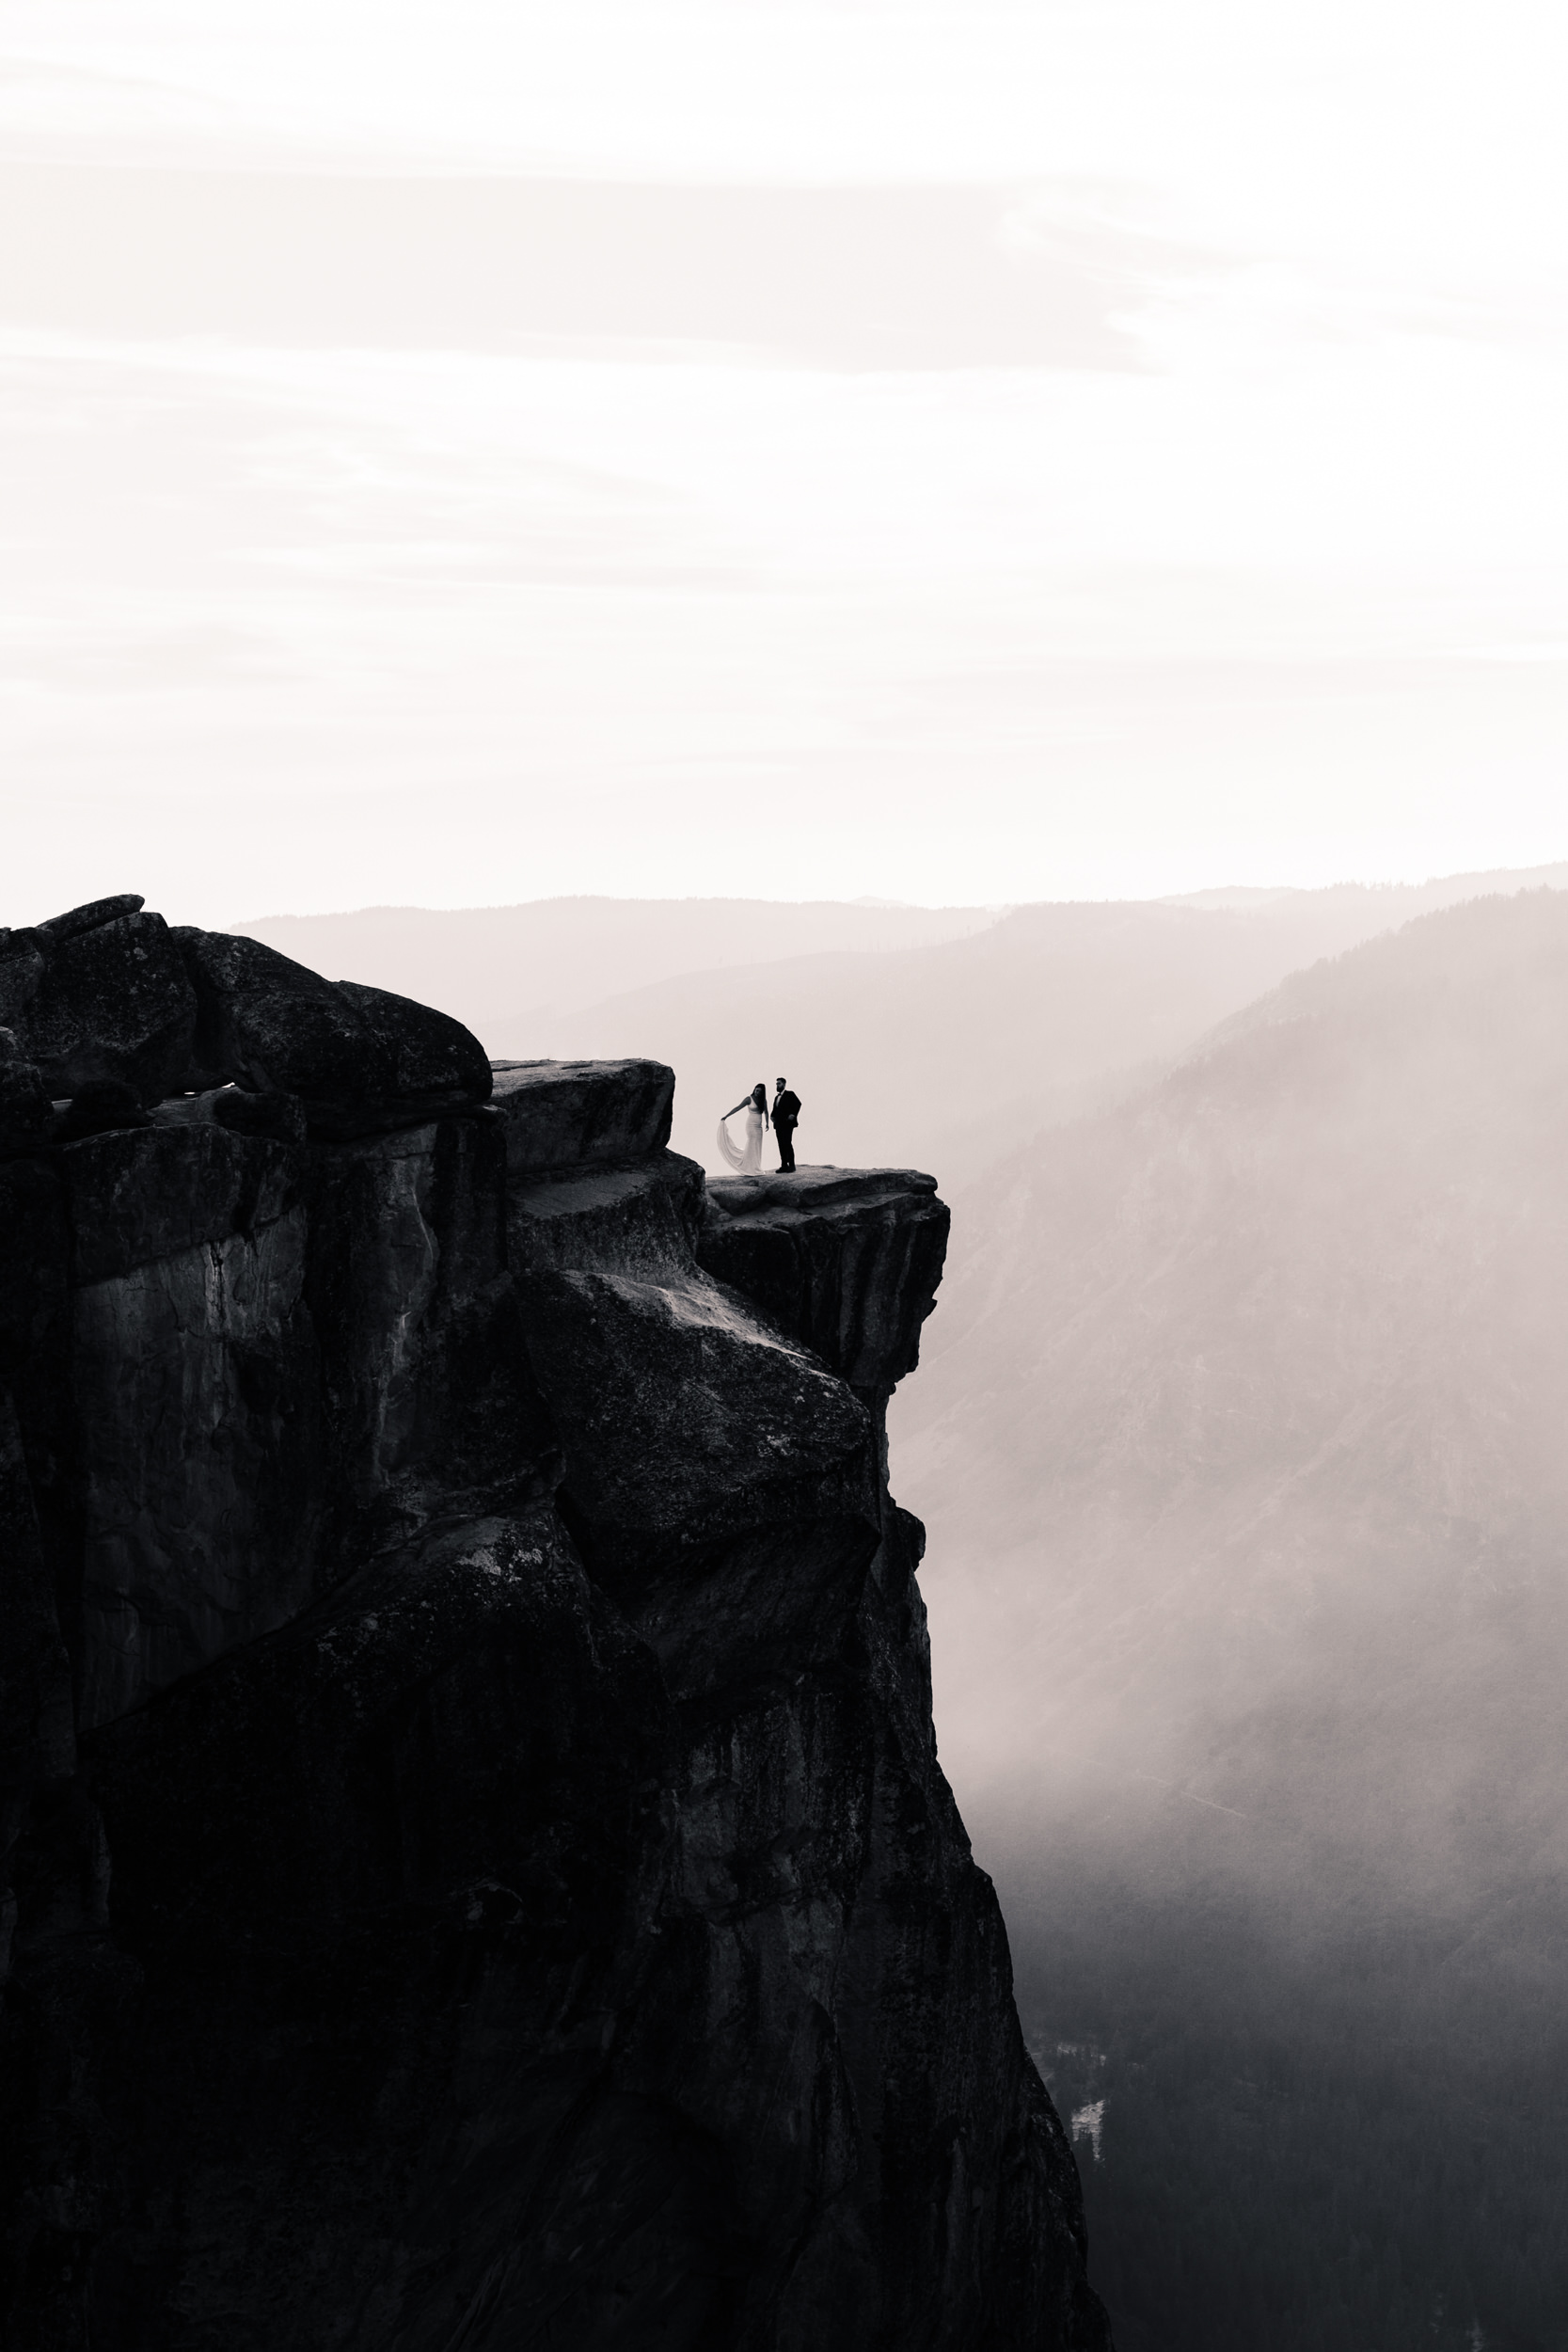 April + Kyle's Adventurous Wedding Portraits in Yosemite National Park   the hearnes adventure wedding photography   taft point elopement